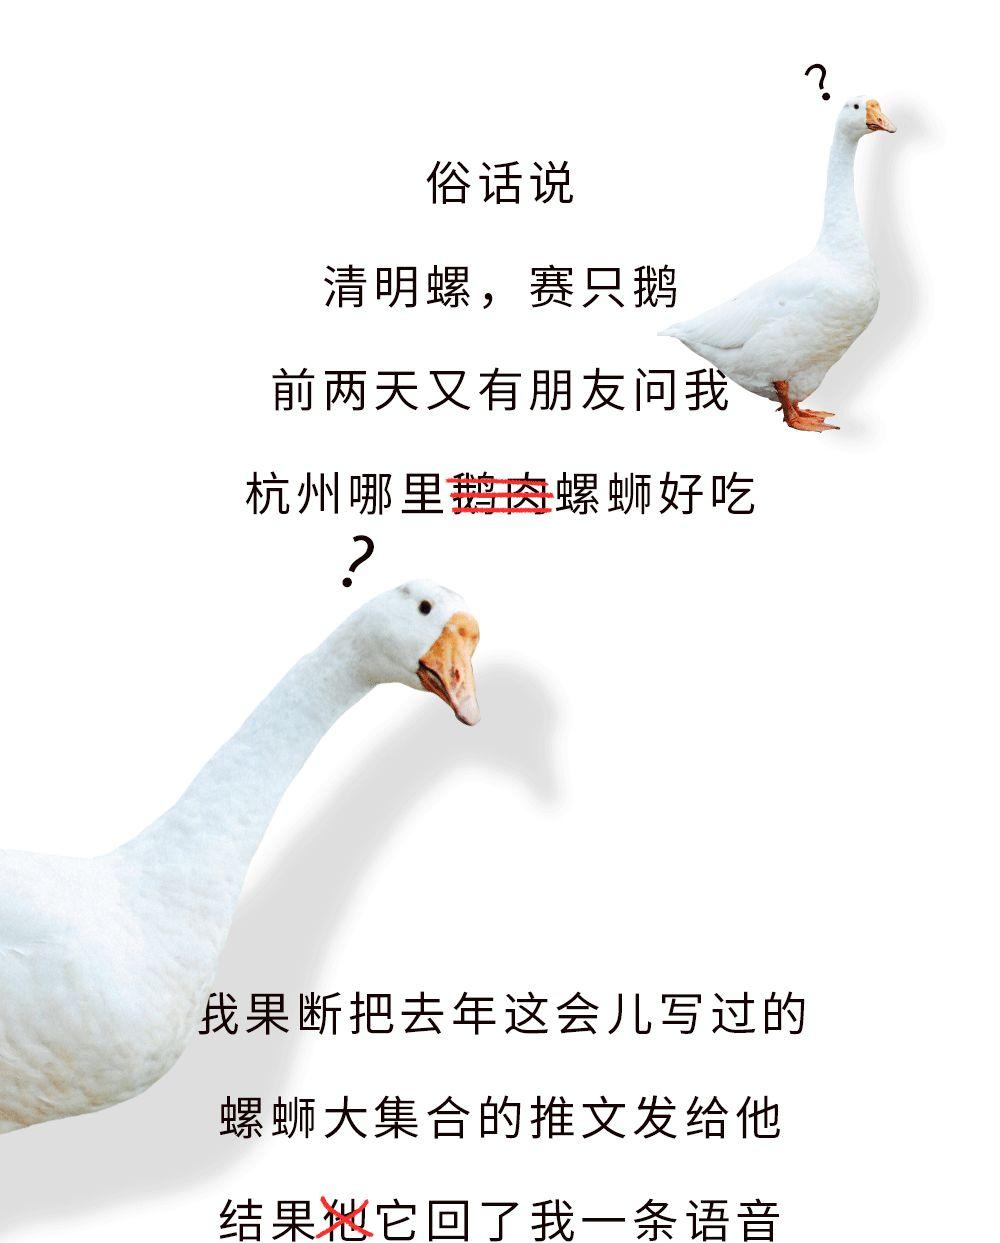 <b>什么!去杭州嘬螺蛳!吃还是上海人会吃!</b>